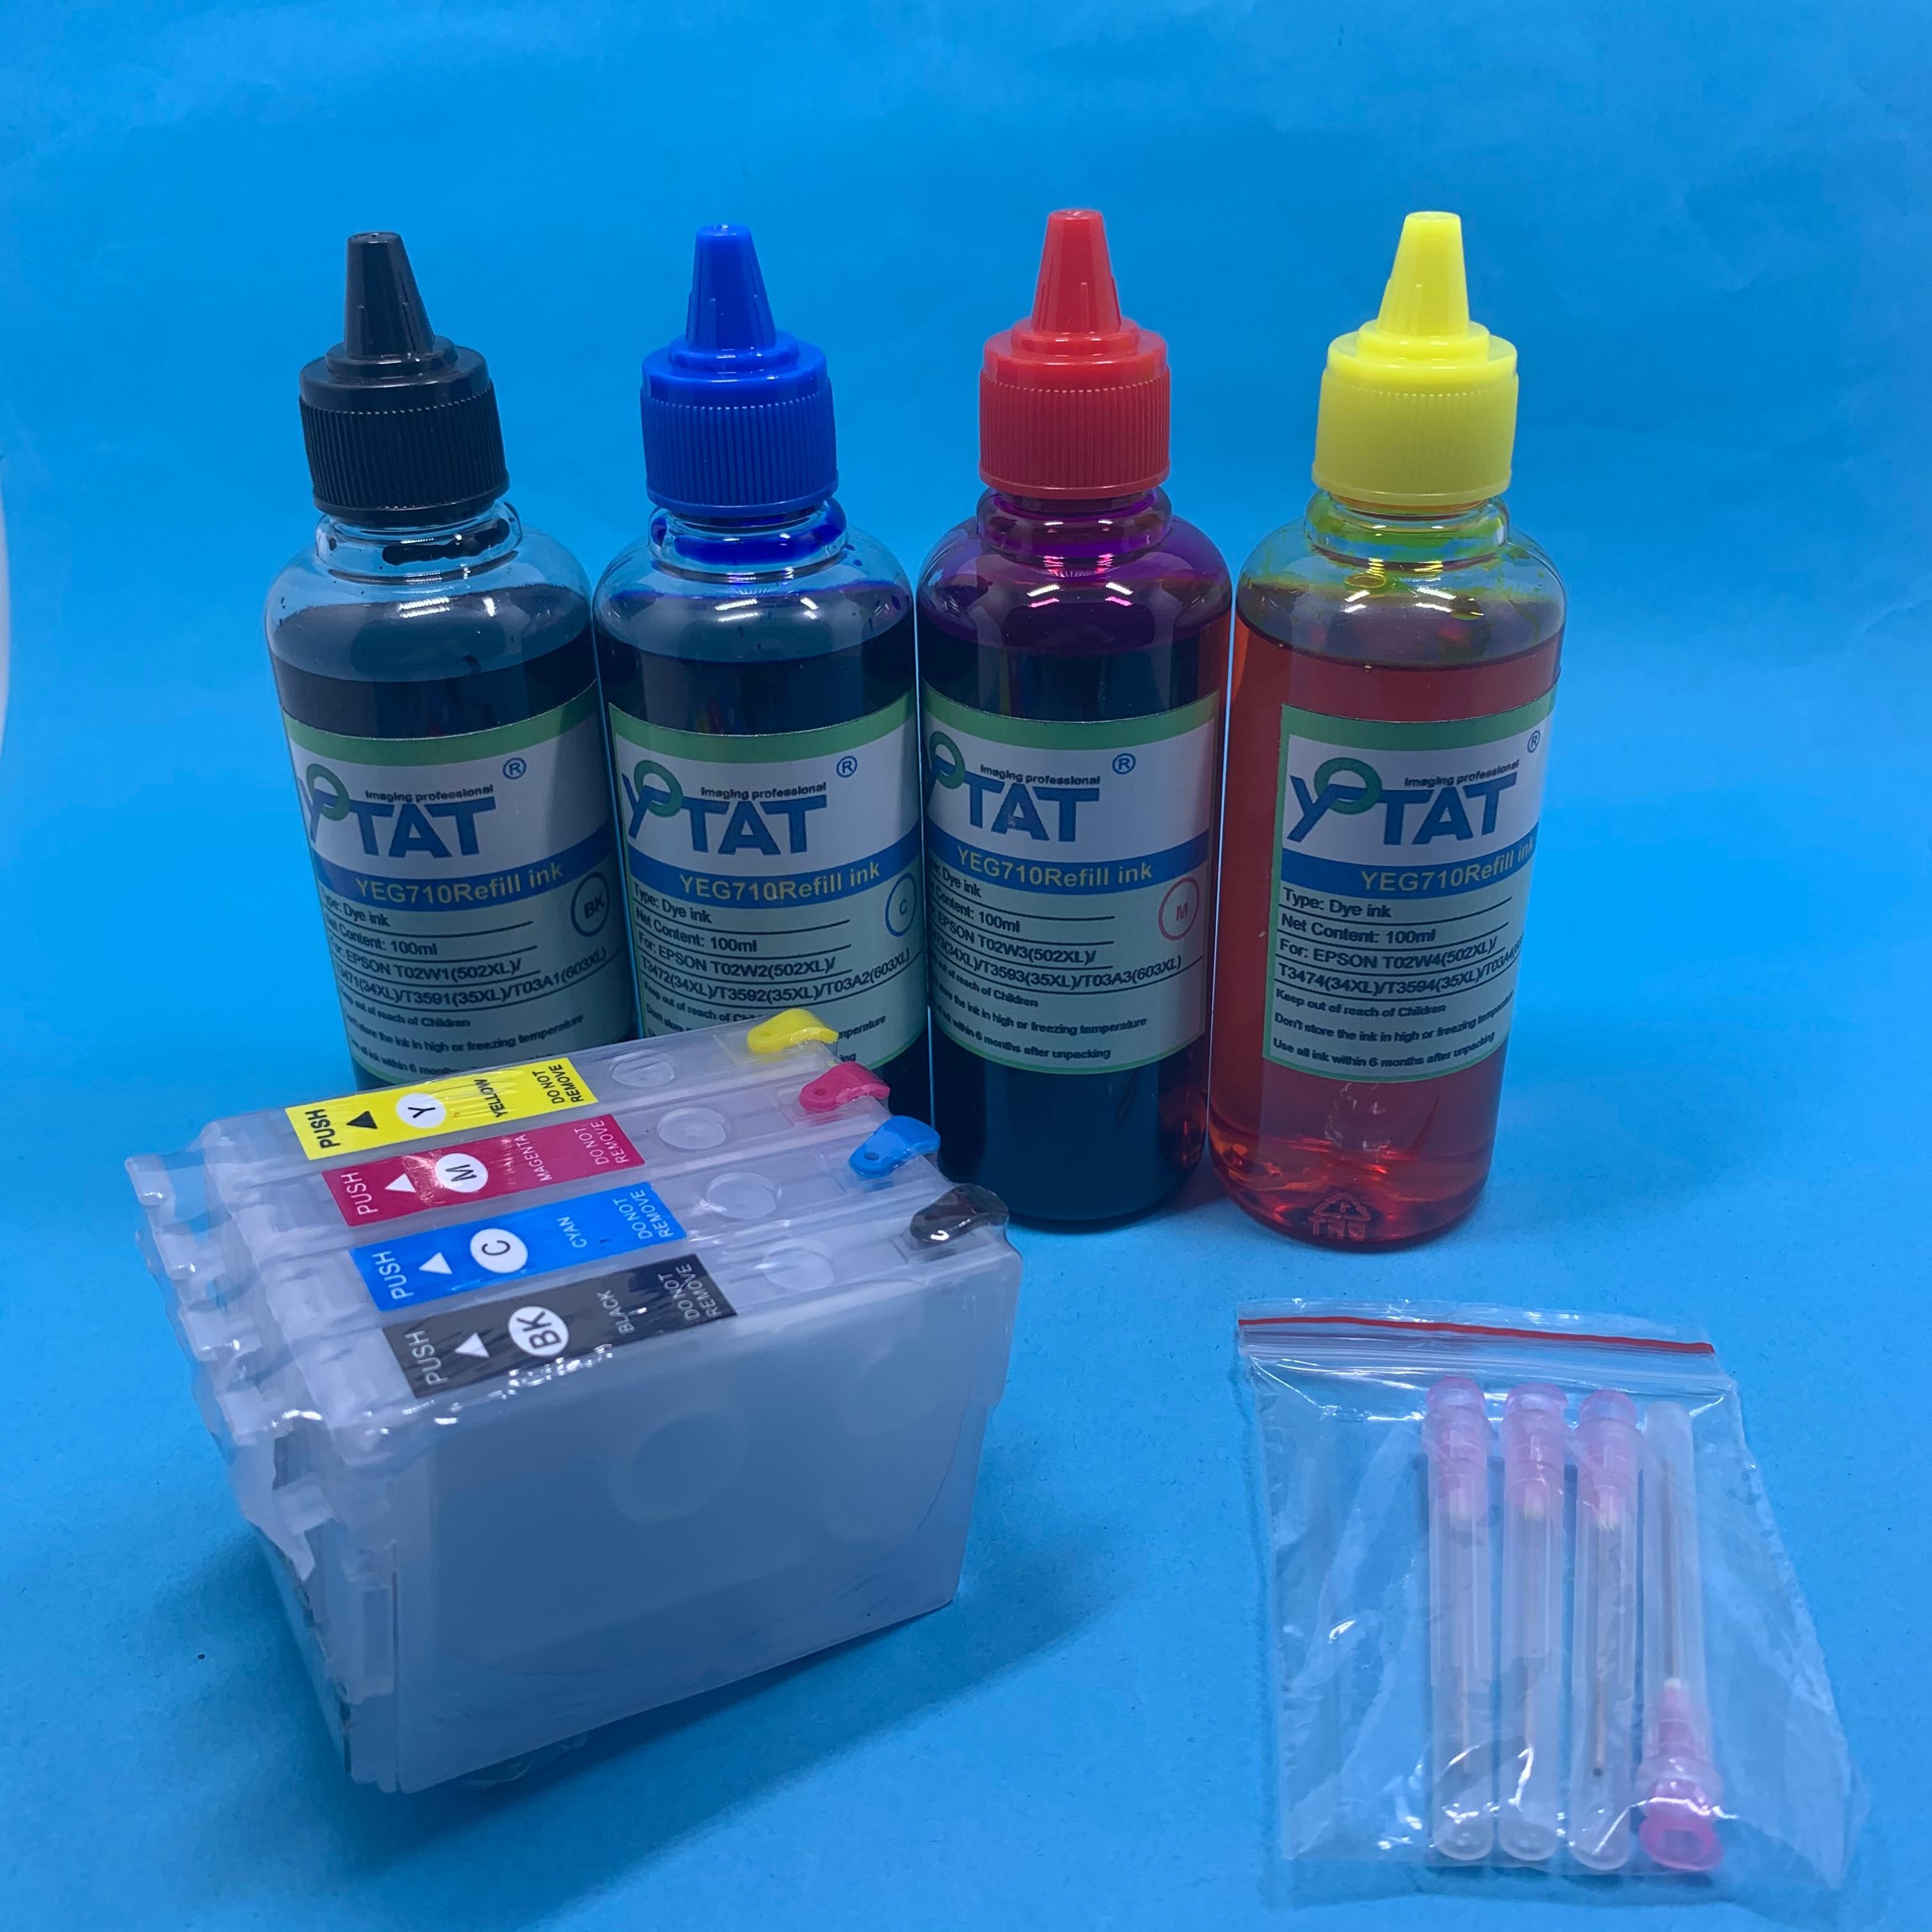 YOTAT T603 recargable 603XL cartucho de tinta T03A1-T03A4 para Epson XP-2100 XP-2105 XP-3100 XP-3105 XP-4100 XP-4105 WF-2810 WF-2830